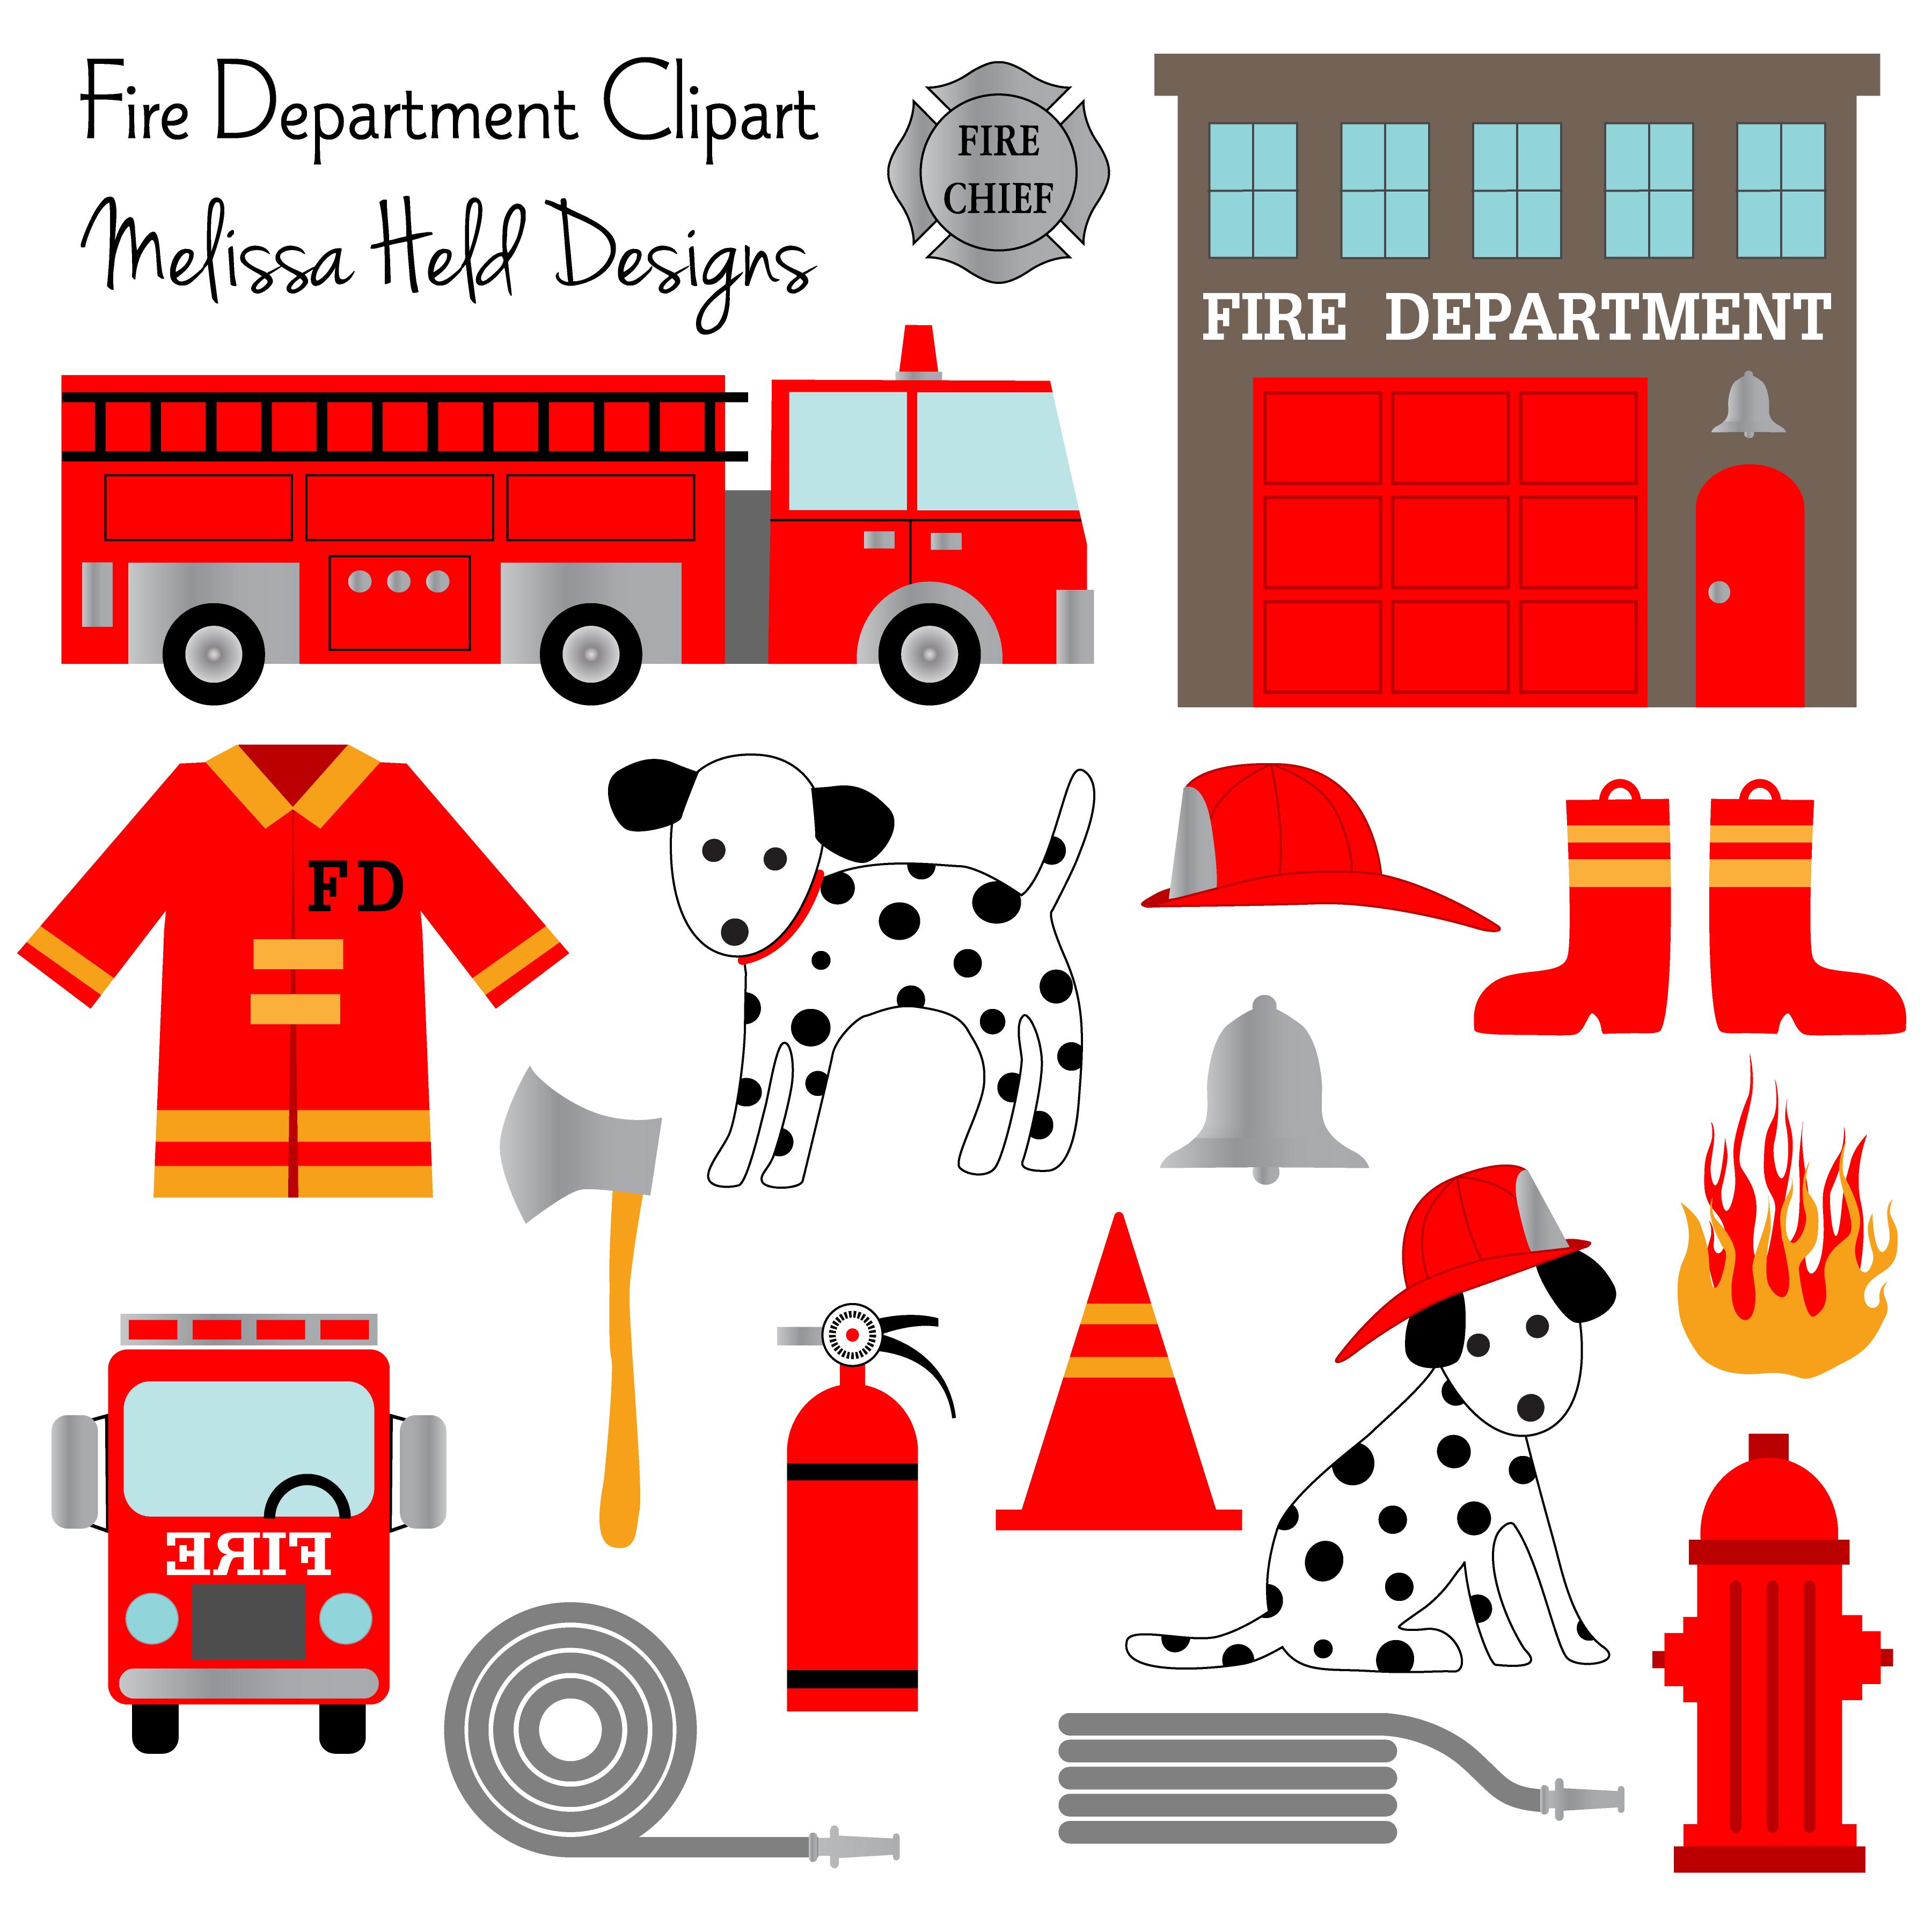 Fire Department Clipart Fire department, Puppy crafts